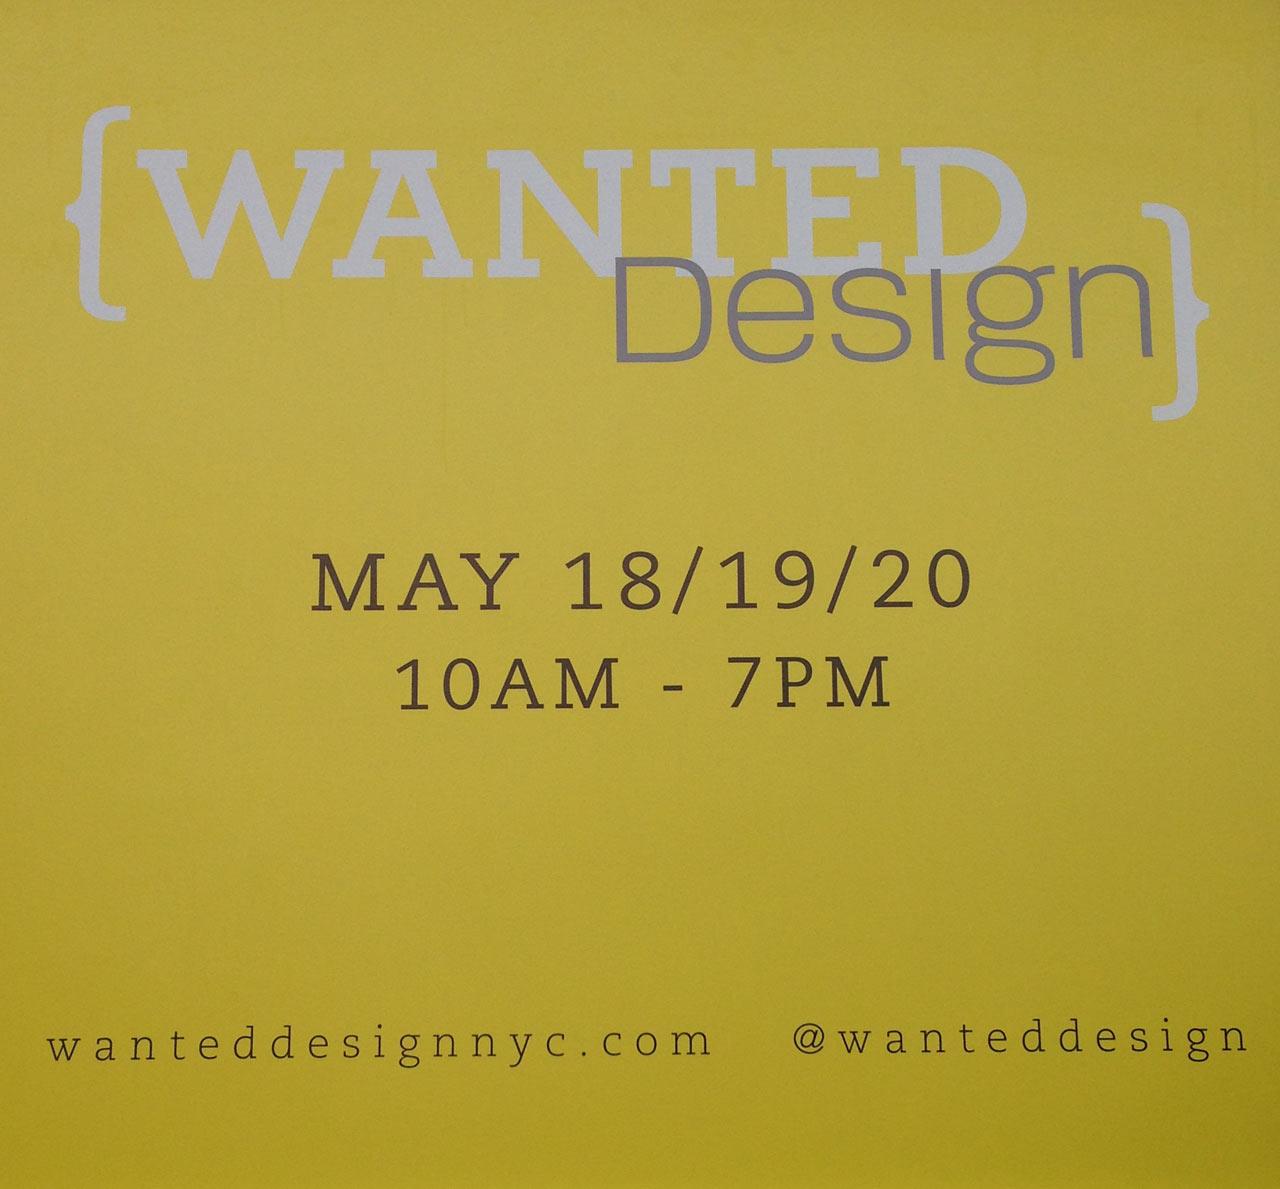 NYCxDesign 2013: WantedDesign Part 1